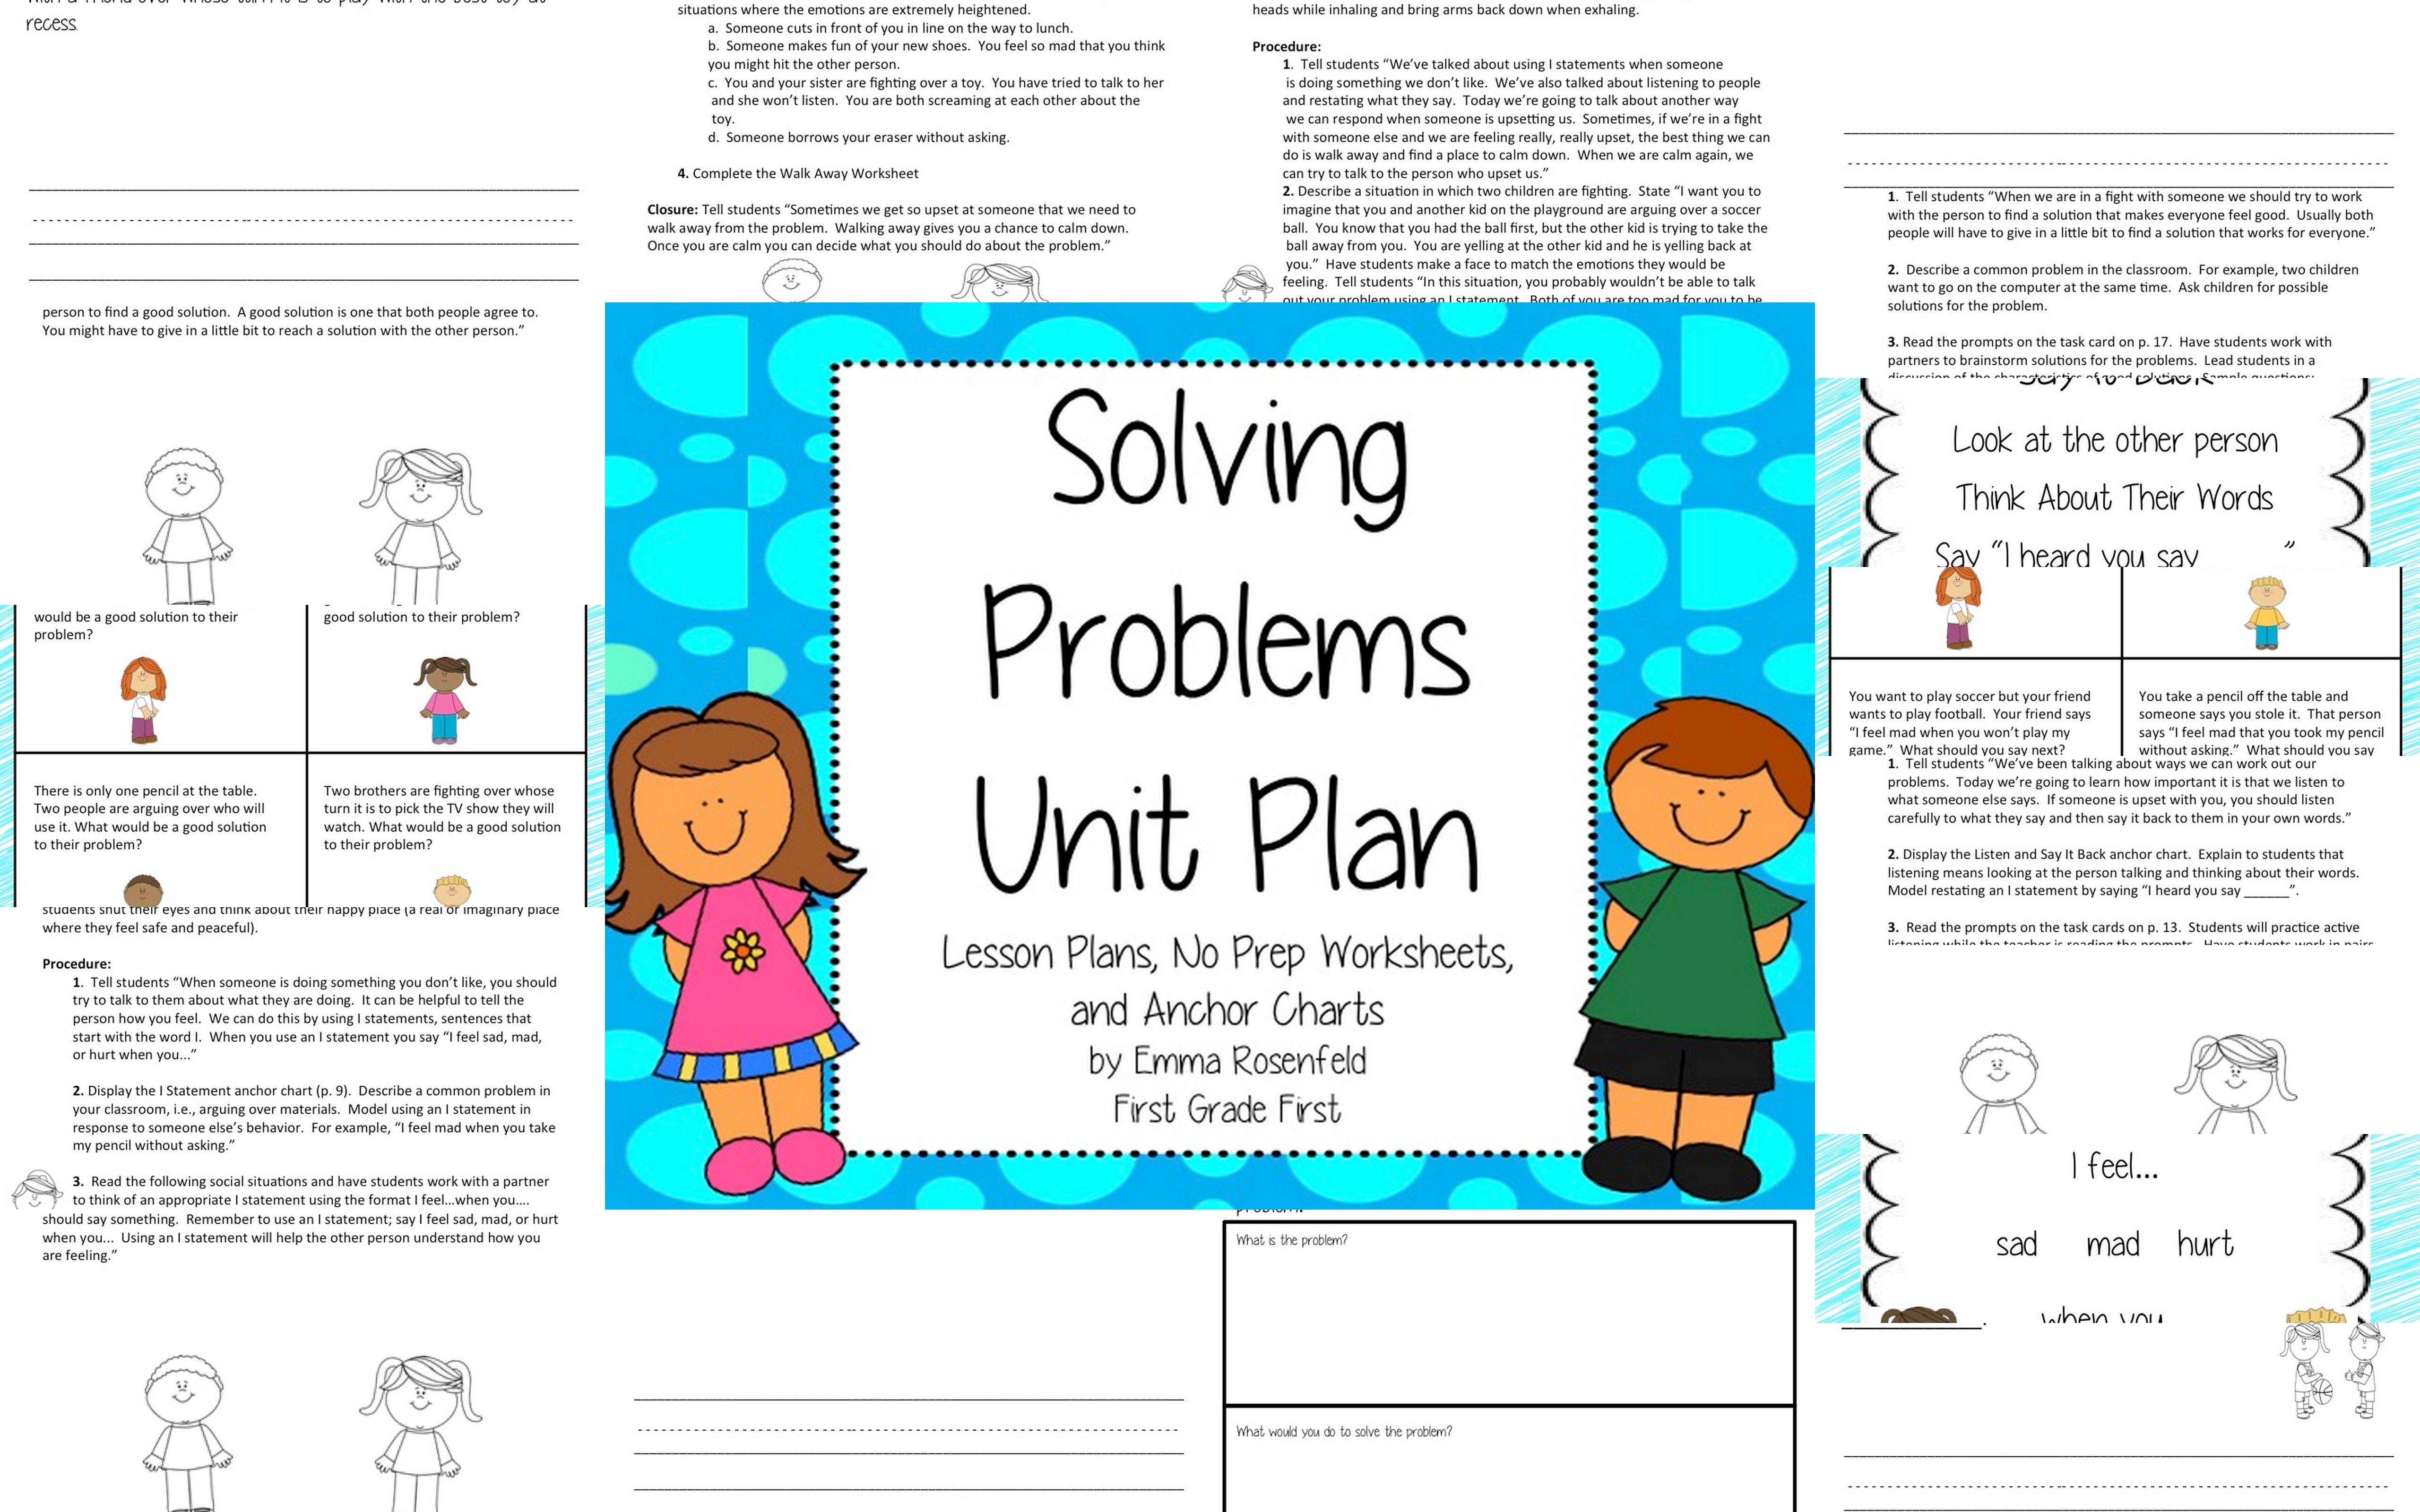 Problem Solving Social Skills Unit Plan | For Educators